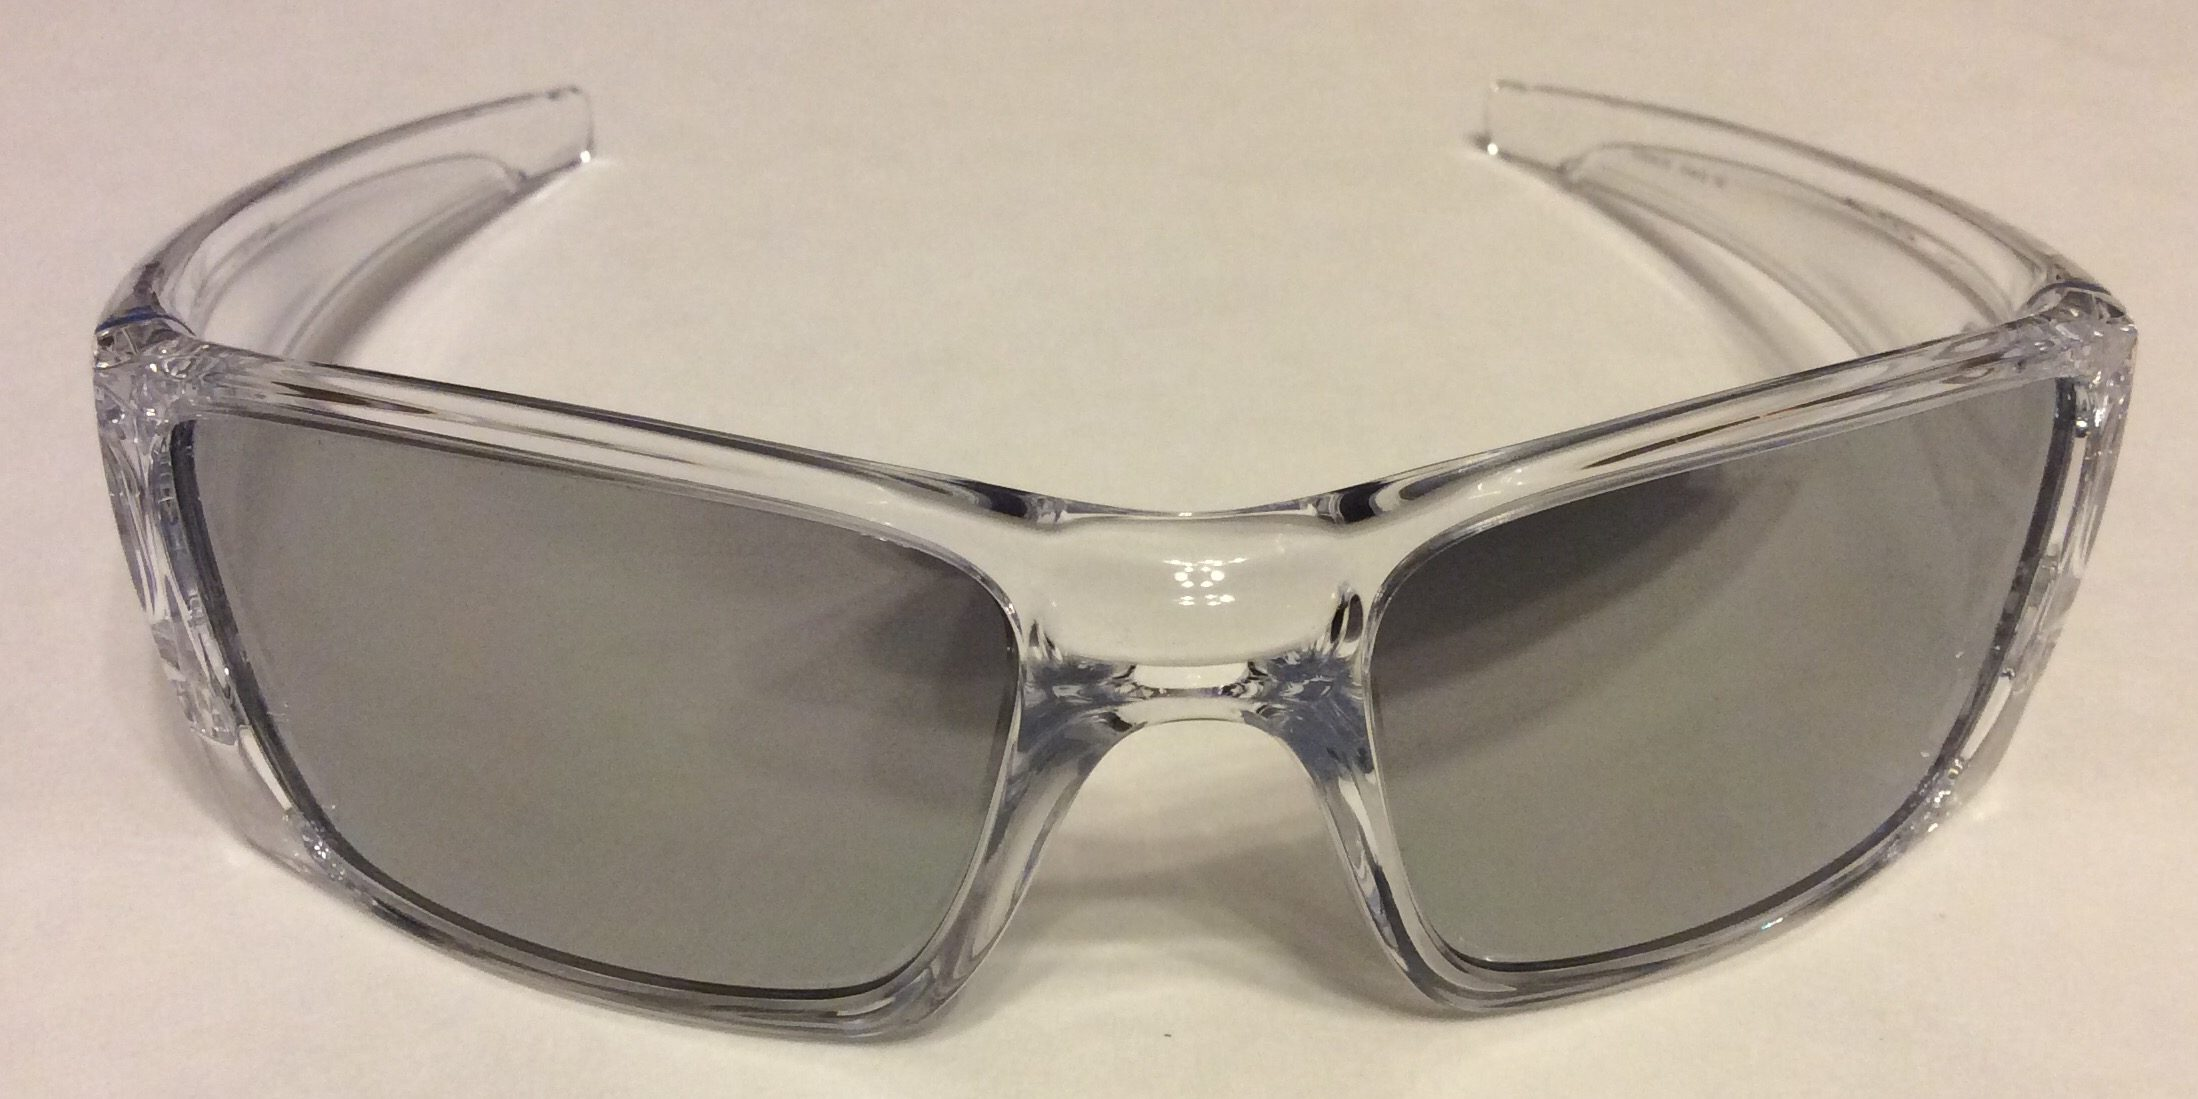 Polarized Hijinx Oakley 2016 Glasses Black Frame Silver Lens